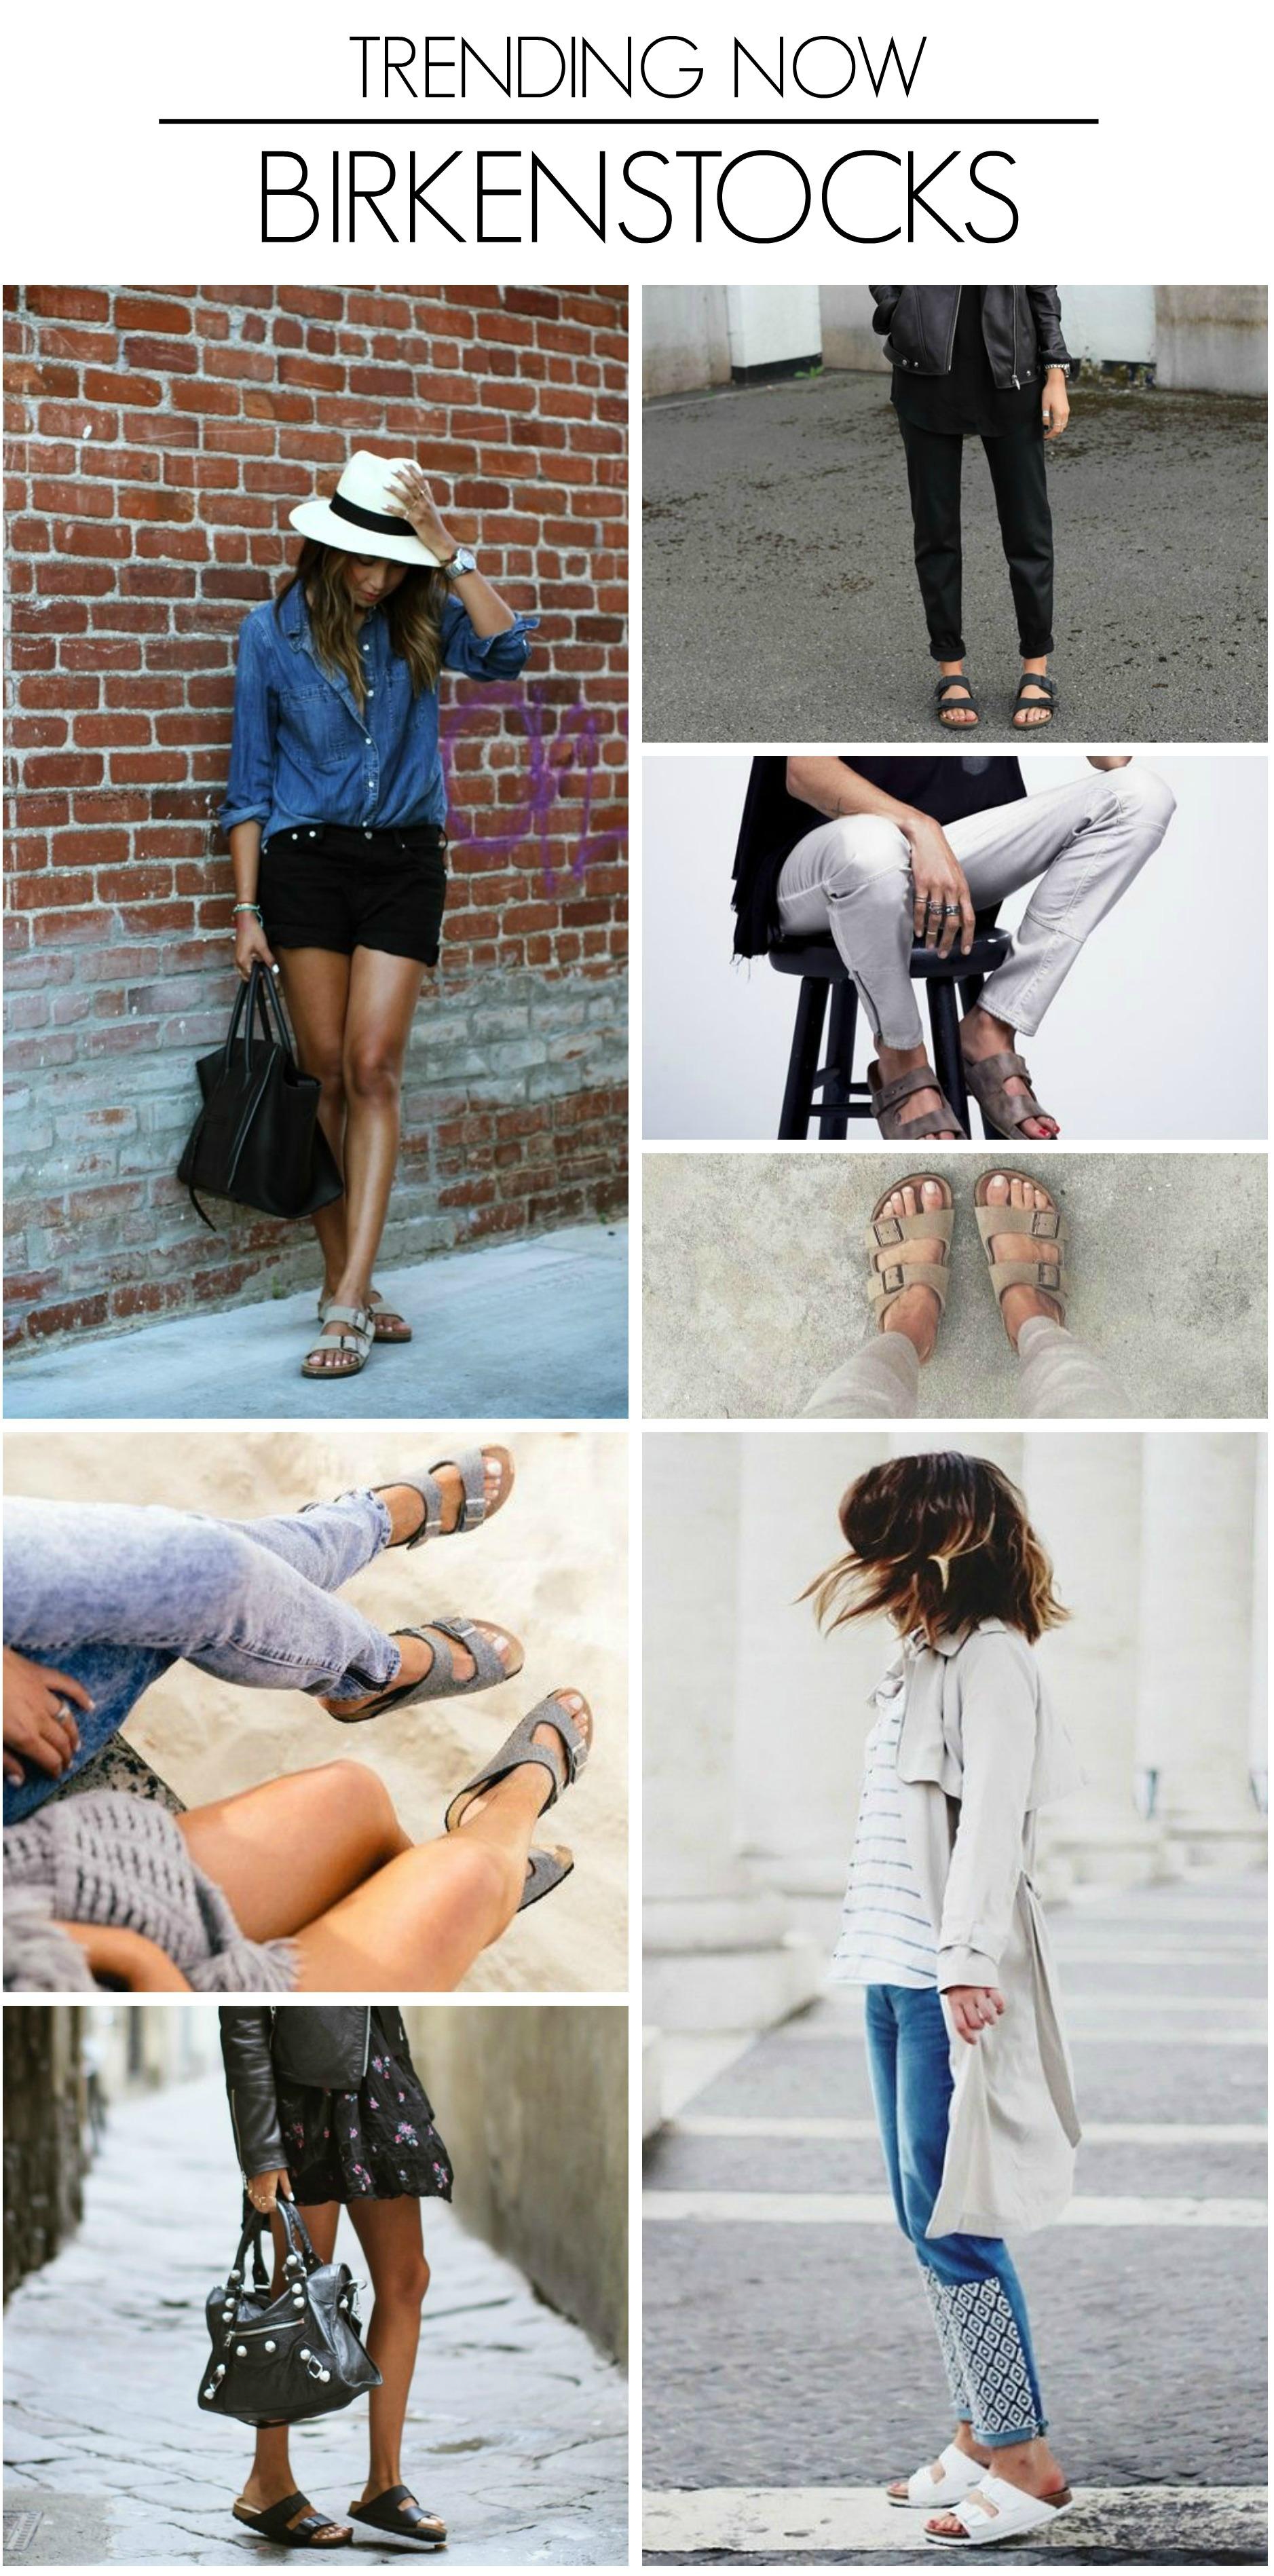 How To Wear Birkenstocks This Fall 2020 | FashionGum.com